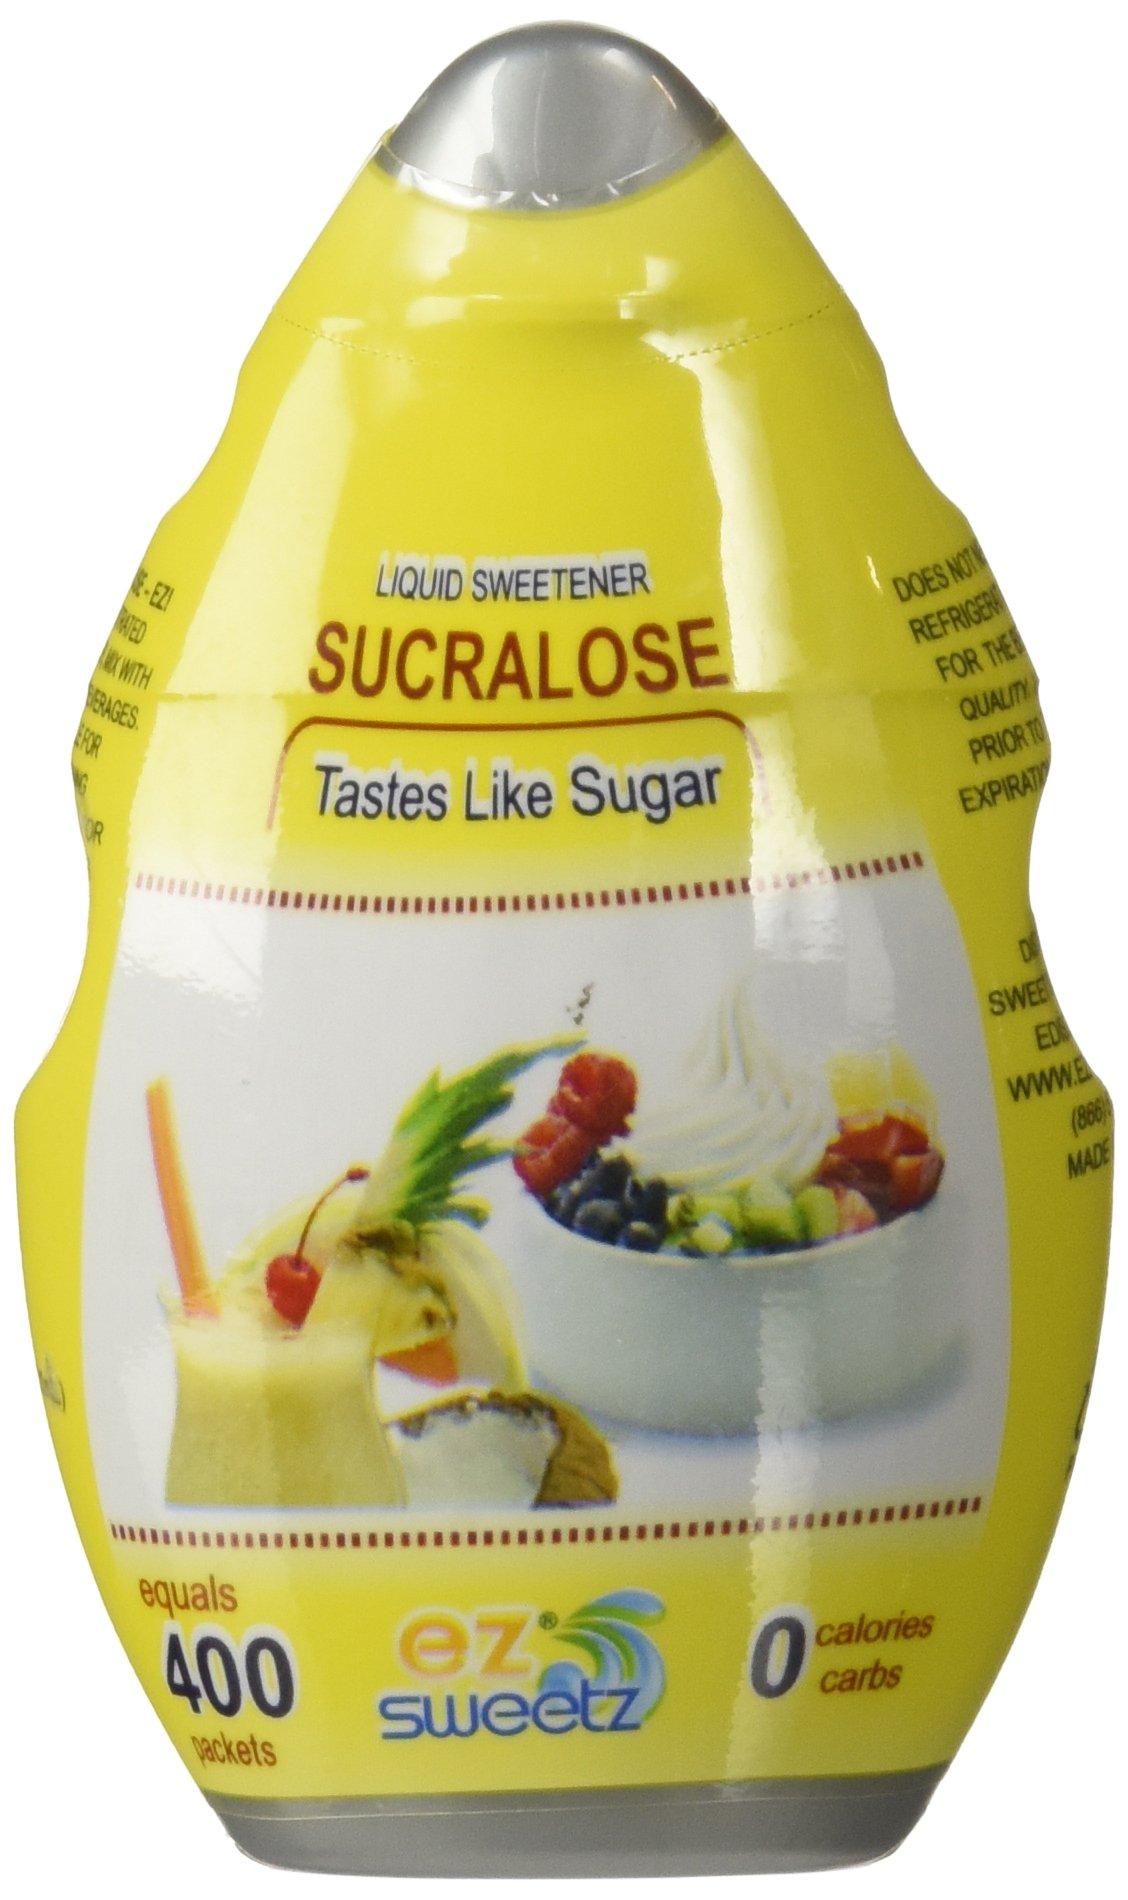 EZ-Sweetz (1.05oz - Liquid Sweetener 400 Servings/Bottle) by EZ-Sweetz